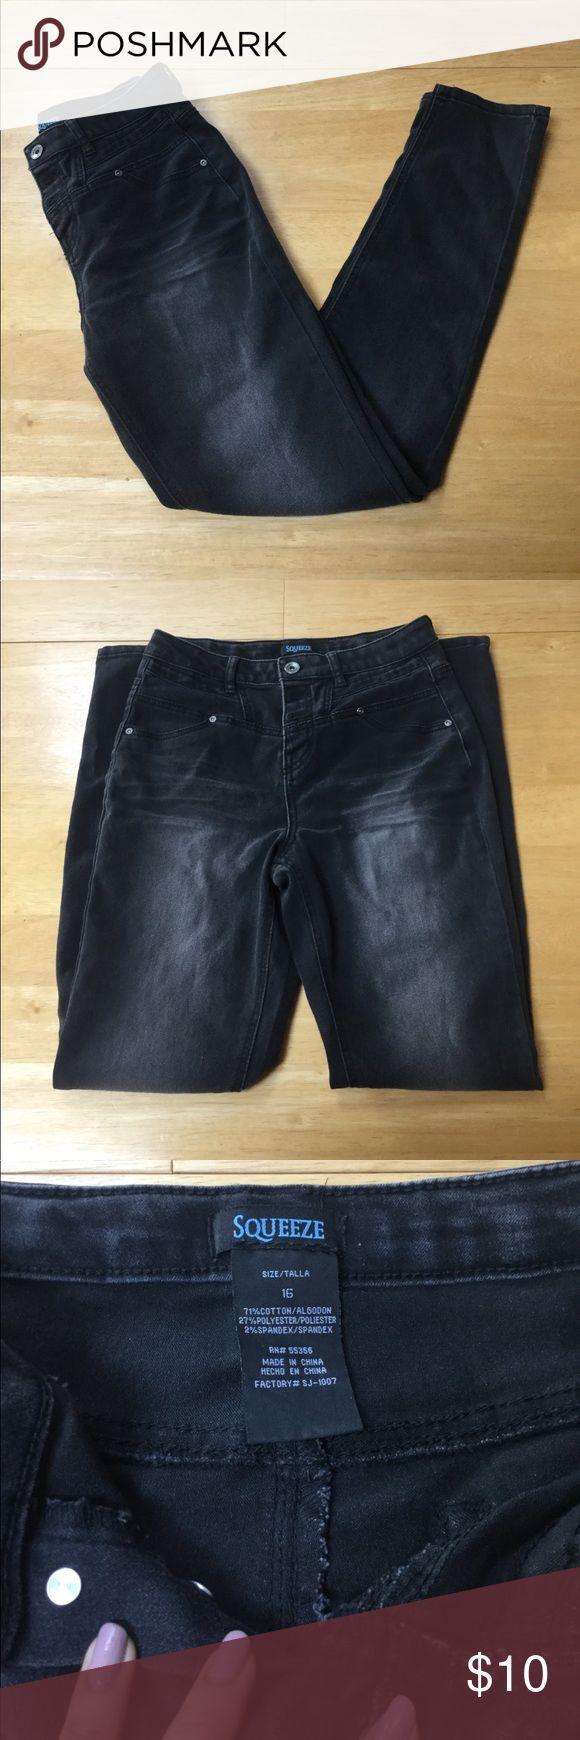 Black Denim Jeggings Description: black denim jeggings w/ button up waist, 71% cotton, 27% polyester, 2% spandex, Girls size 16- can fit into size 2 Jeans